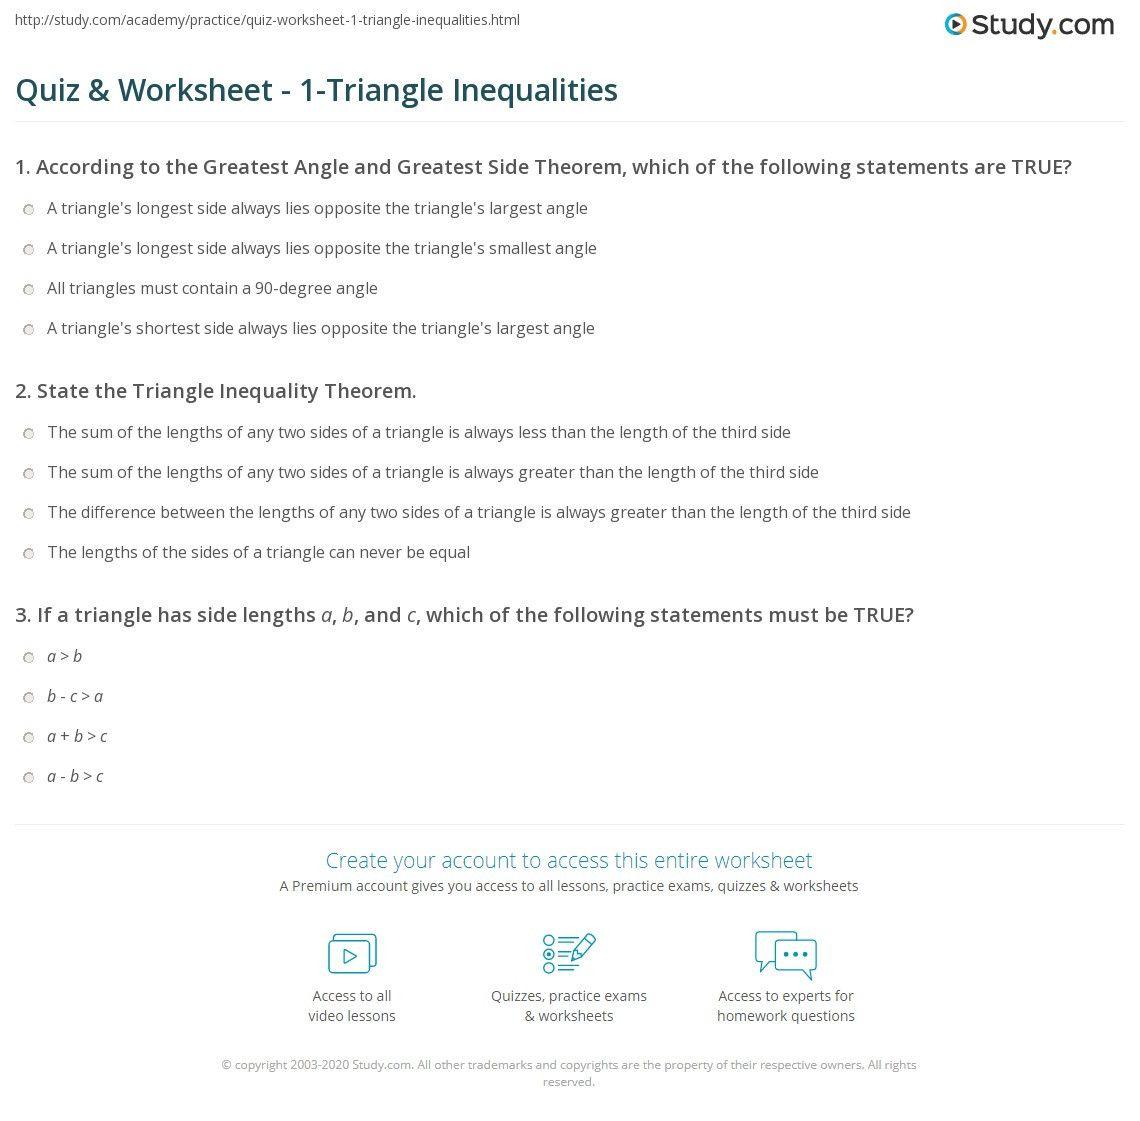 Triangle Inequality Theorem Worksheet Triangle Inequality Theorems Worksheets